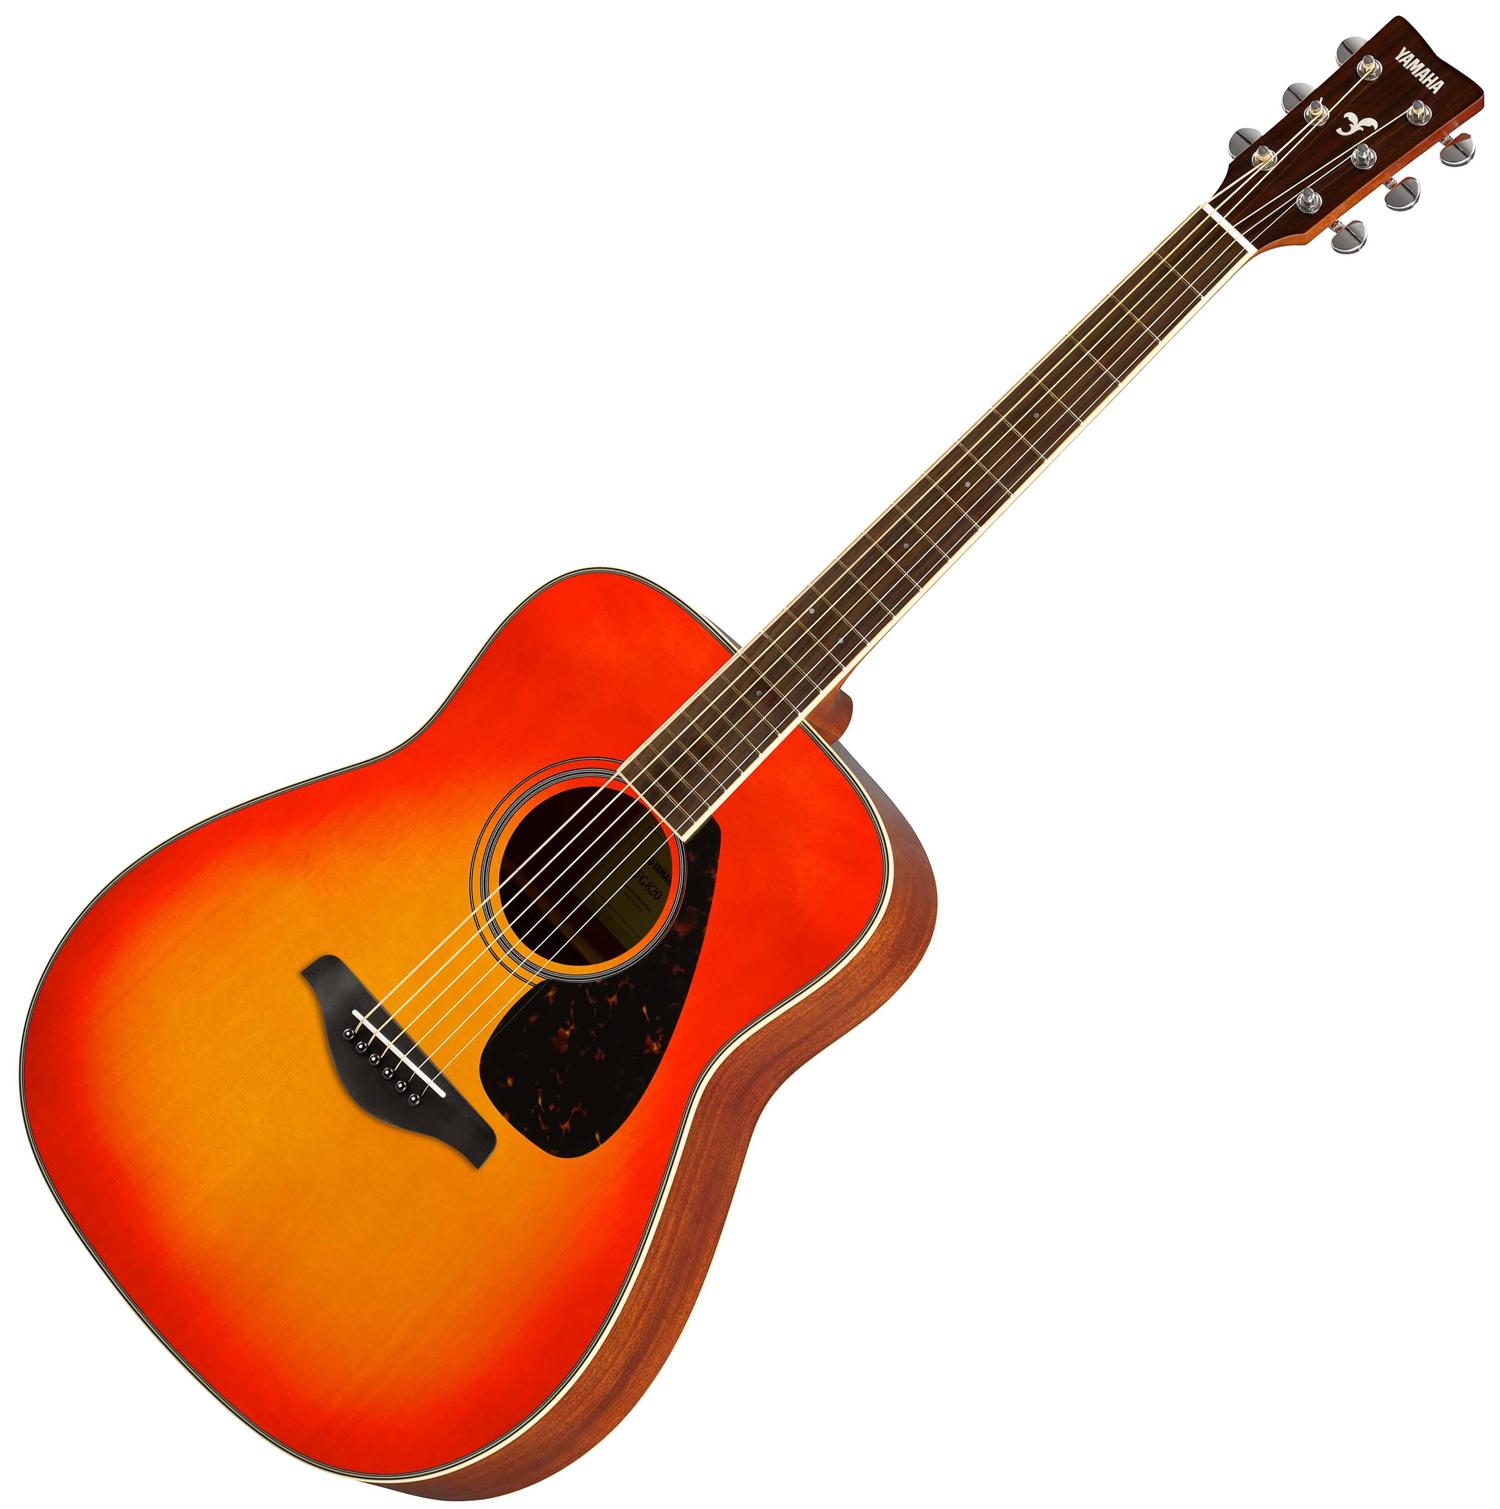 Musicworks Guitars Acoustic Guitars Acoustic Guitars Yamaha Fg820 Solid Top Acoustic Guitar Autumn Burst